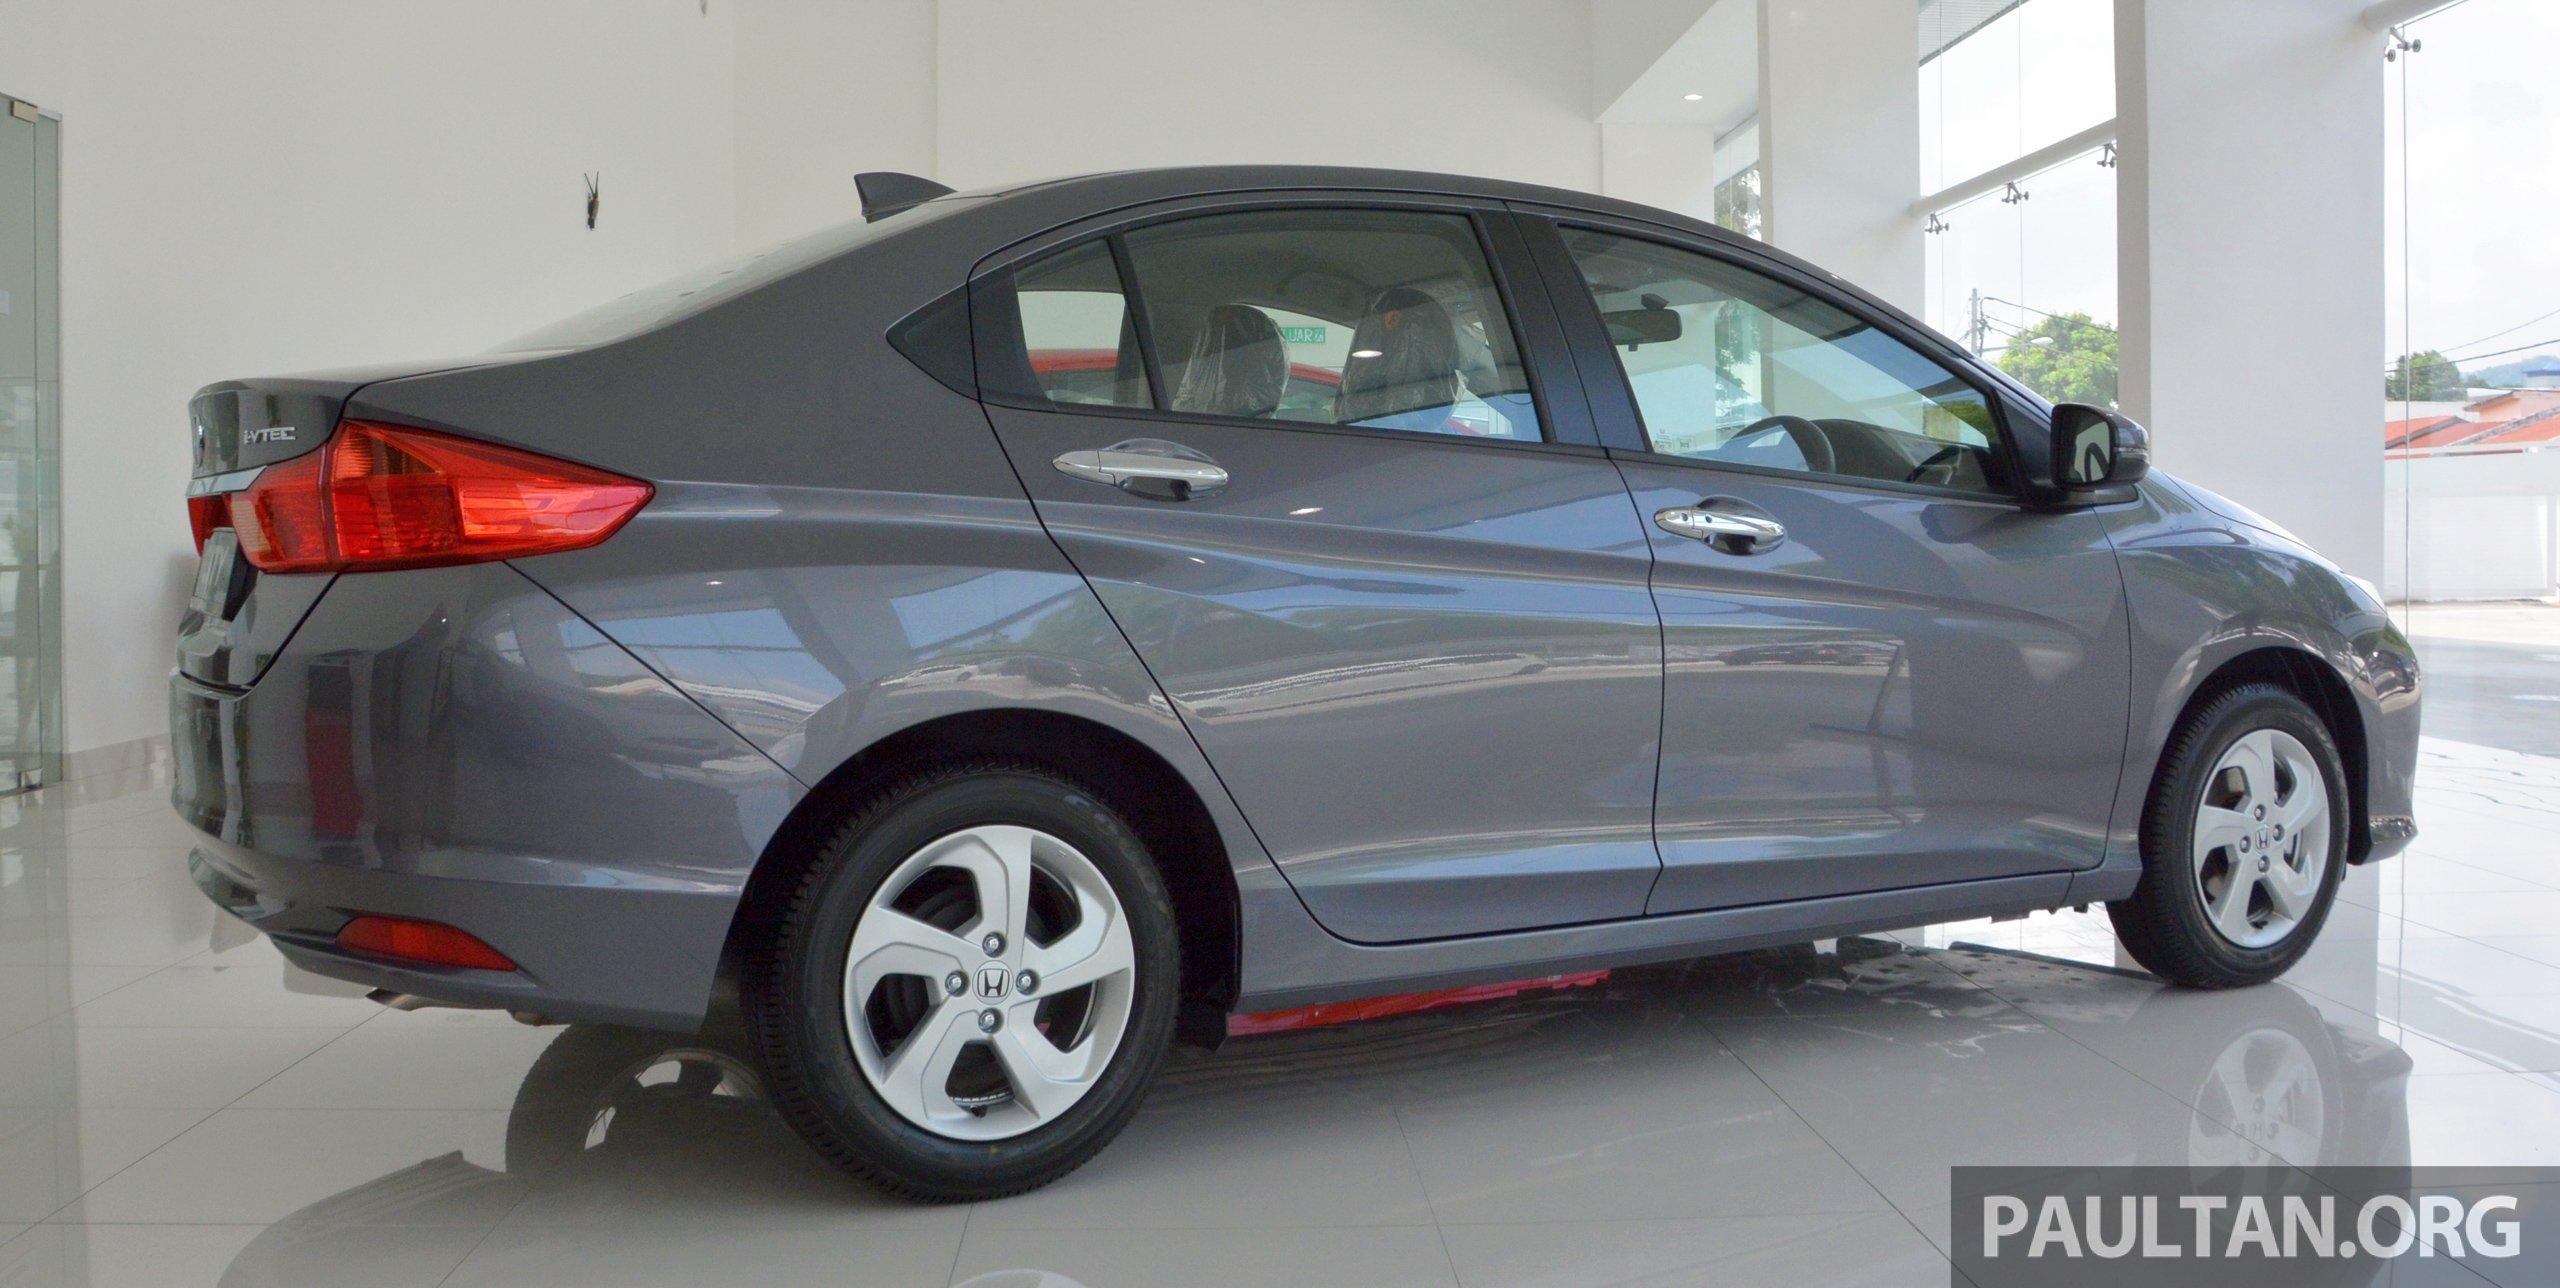 Honda City X 与普通版到底有何不同?来看真车实照吧! Honda City X 03 Paul